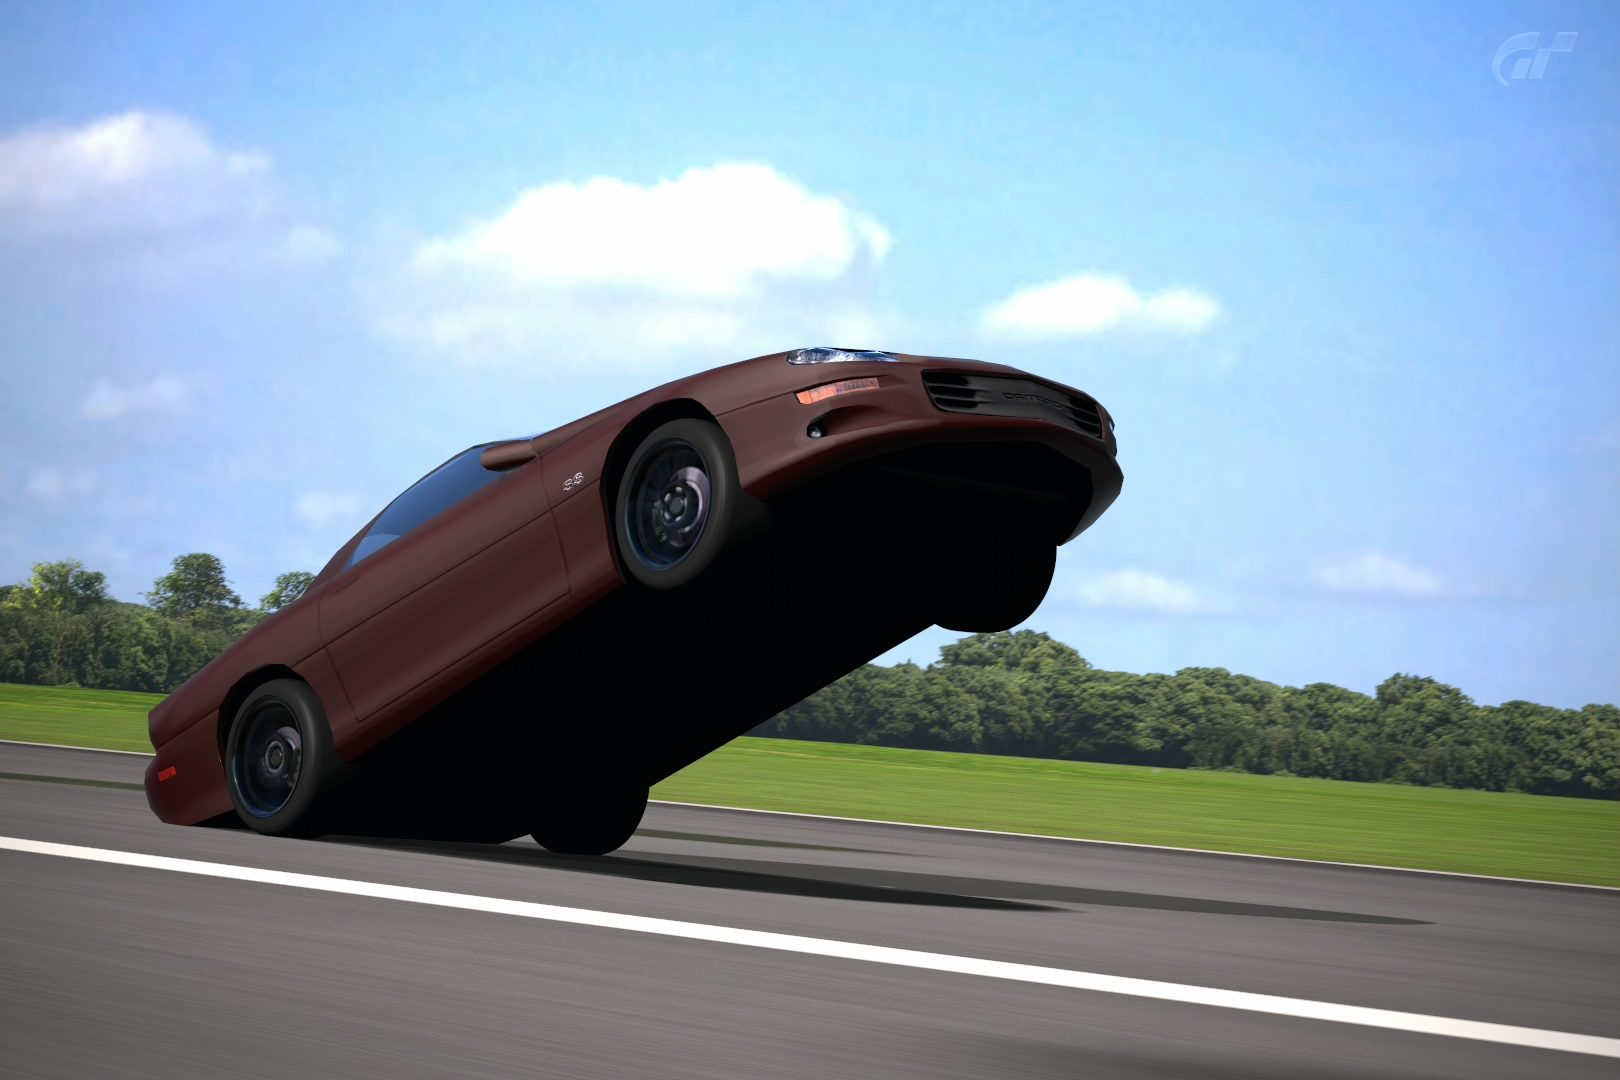 The Top Gear Test Track_1.jpg